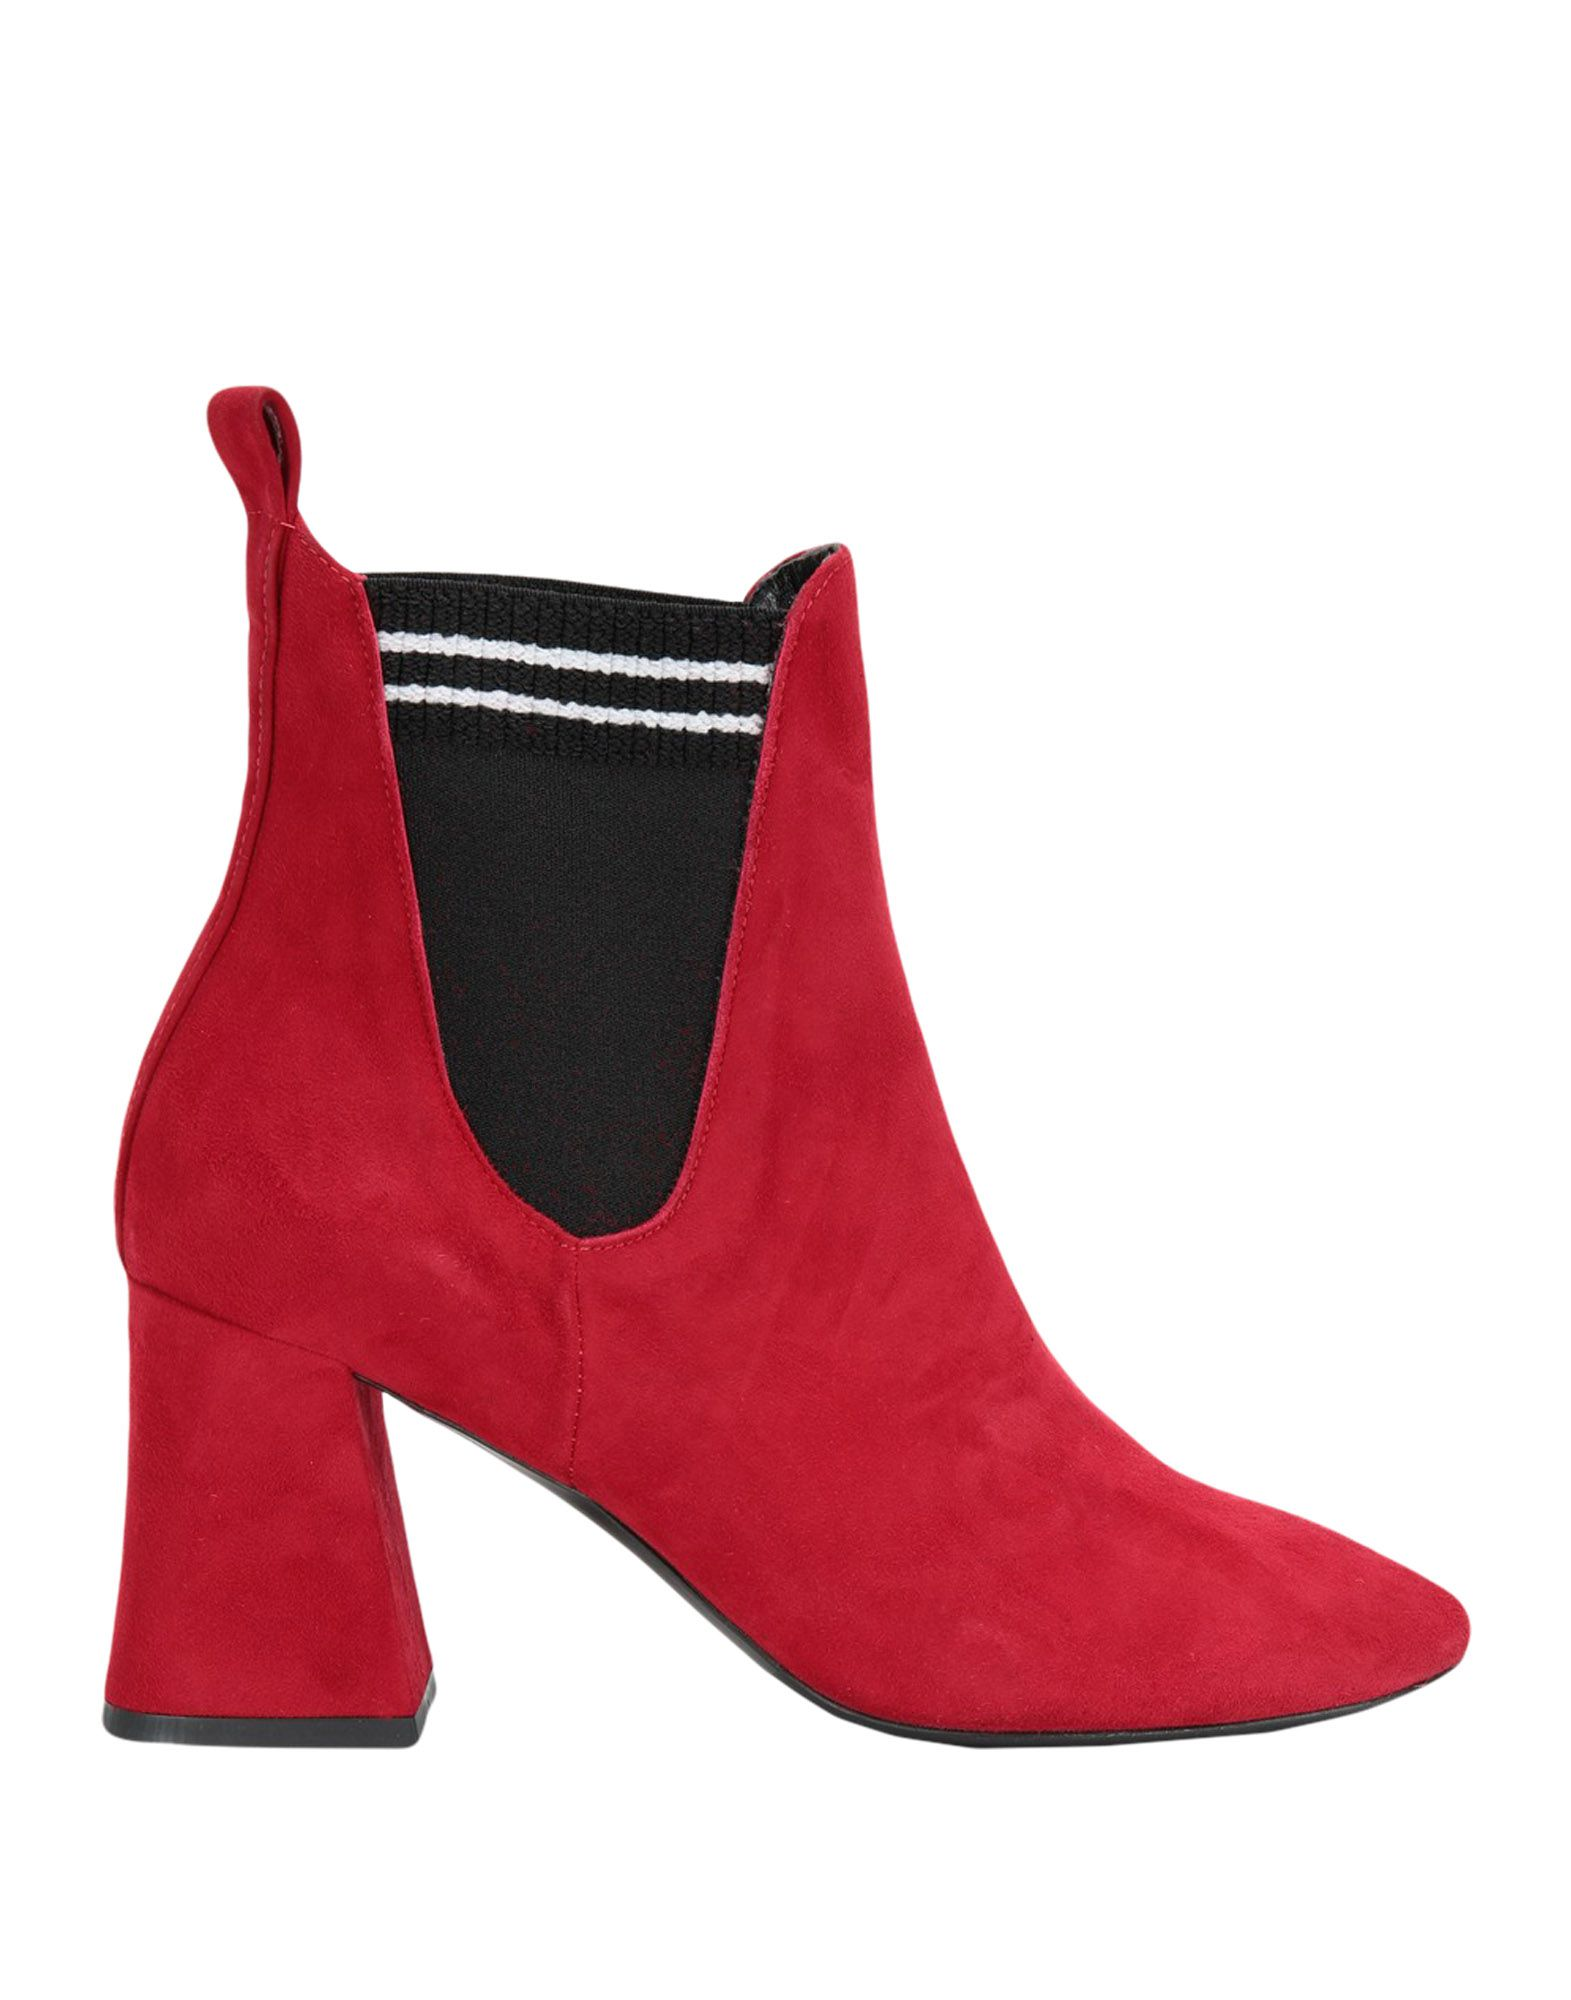 Stilvolle billige Stiefelette Schuhe Stephen Good  London Stiefelette billige Damen  11532992AP 22f252